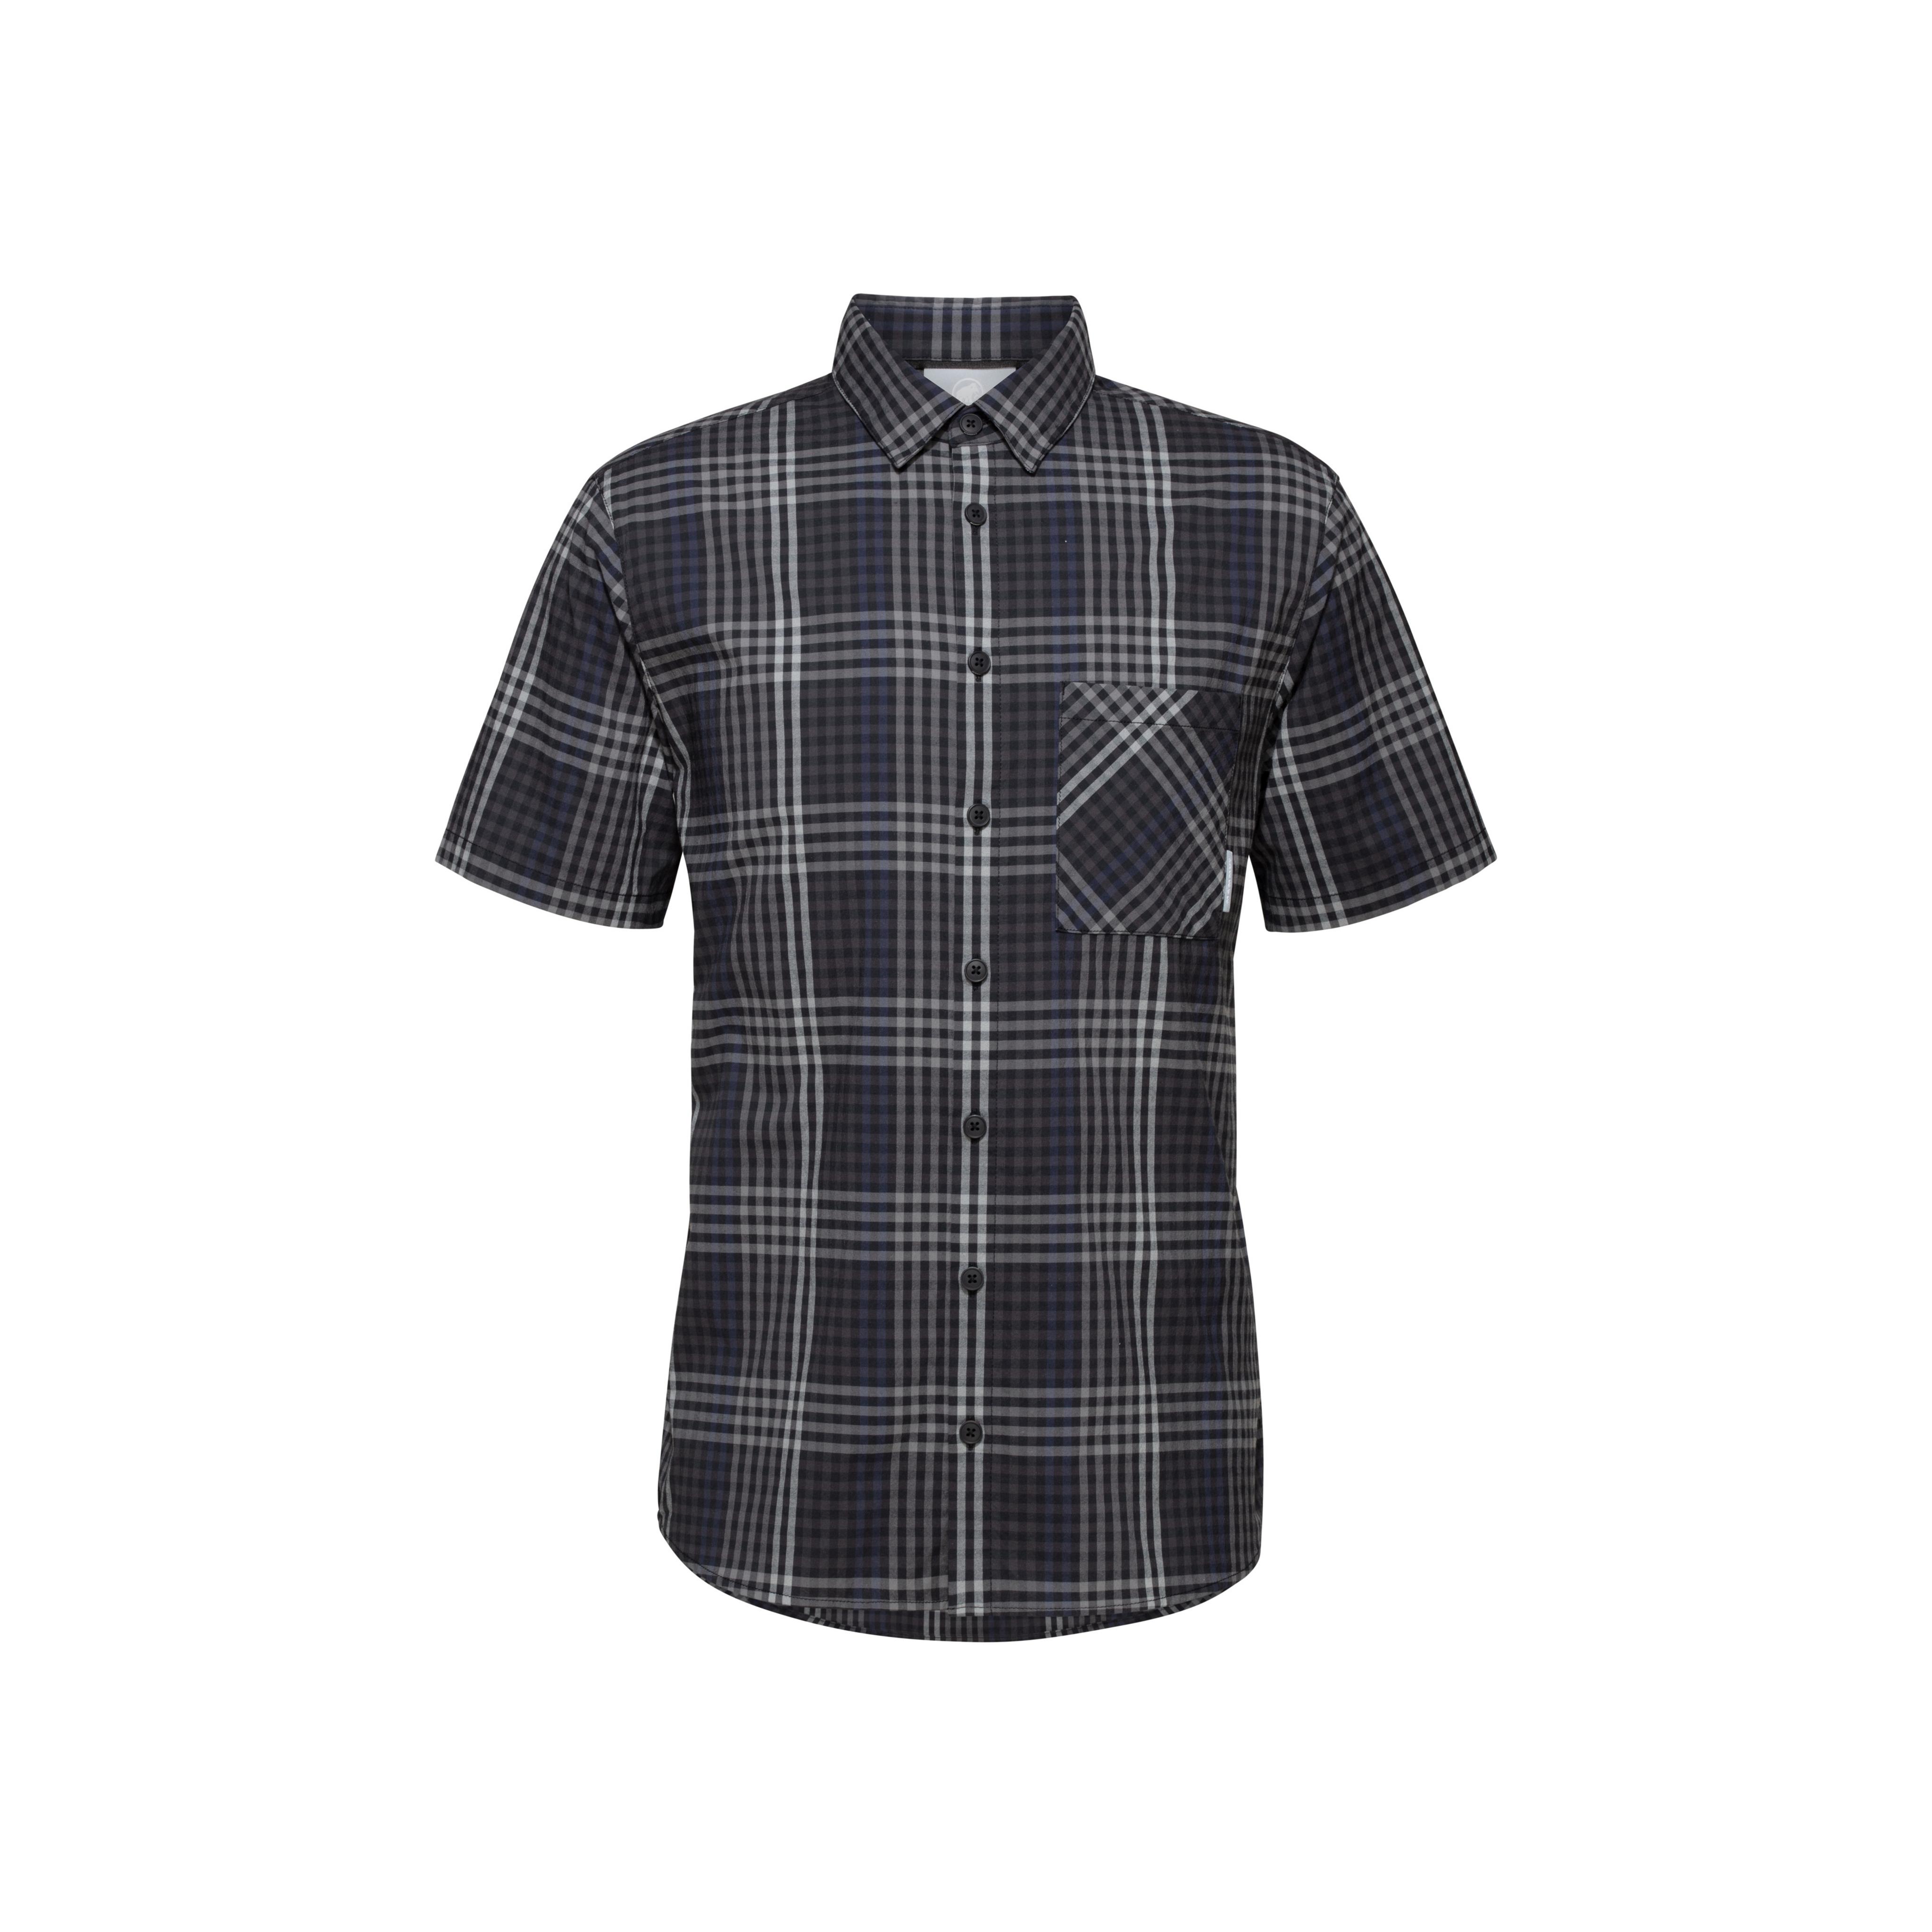 Calanca Shirt Men - phantom-black, S thumbnail